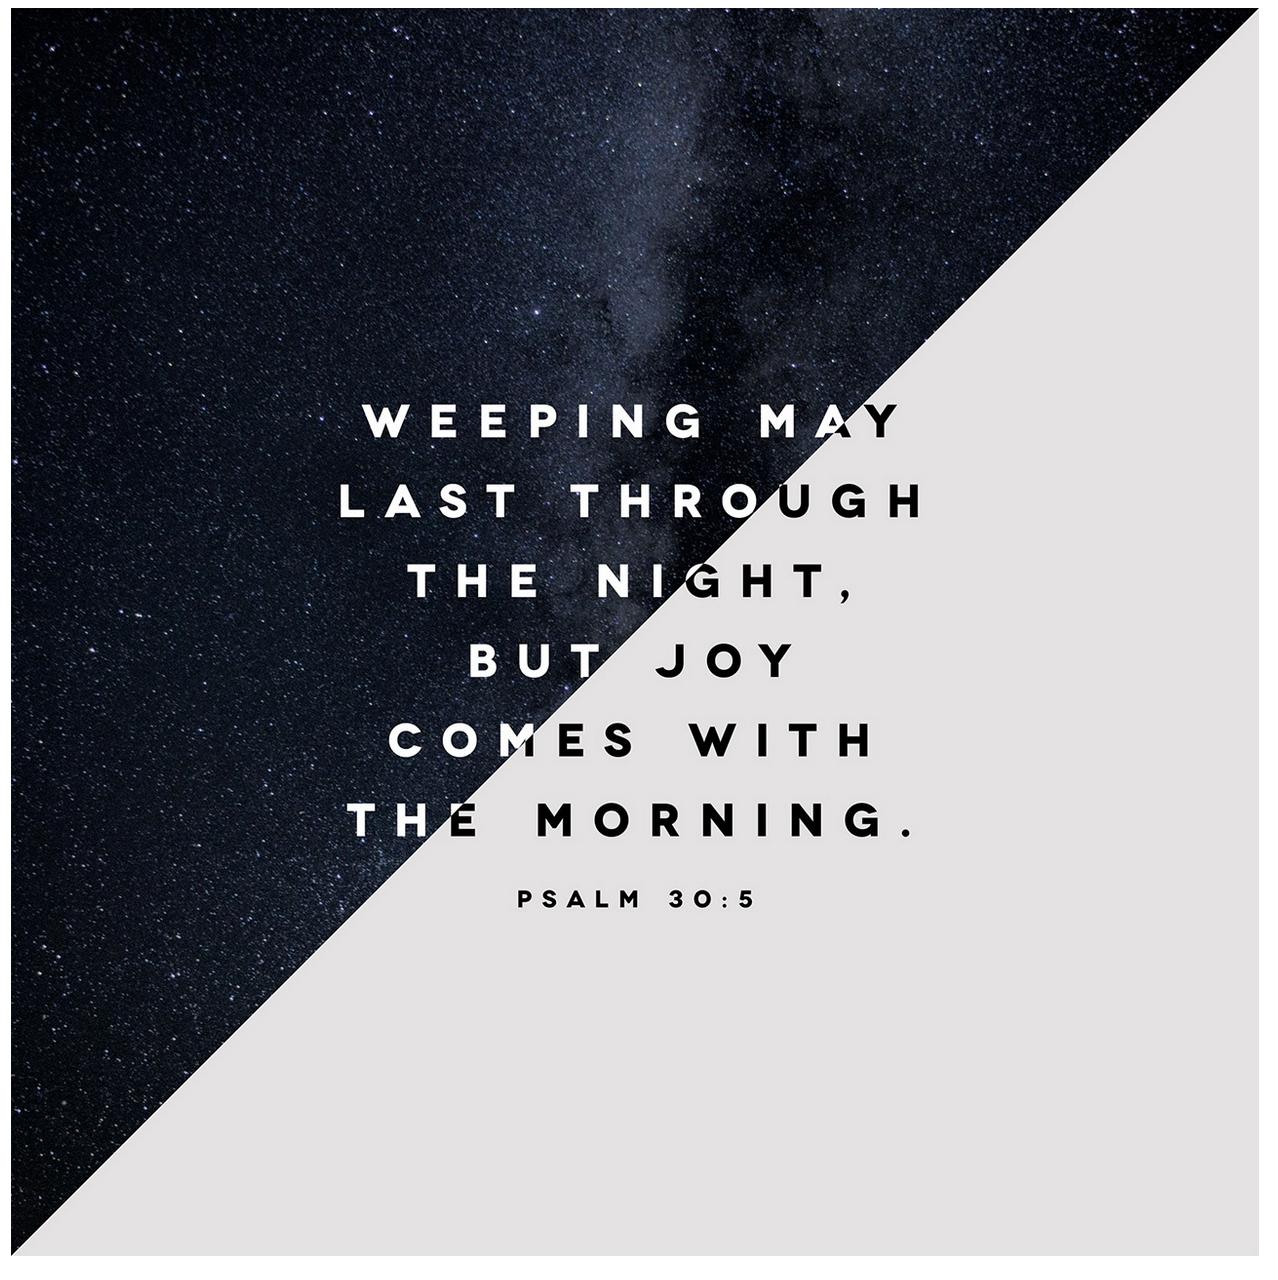 Image Credit: Bible Hub